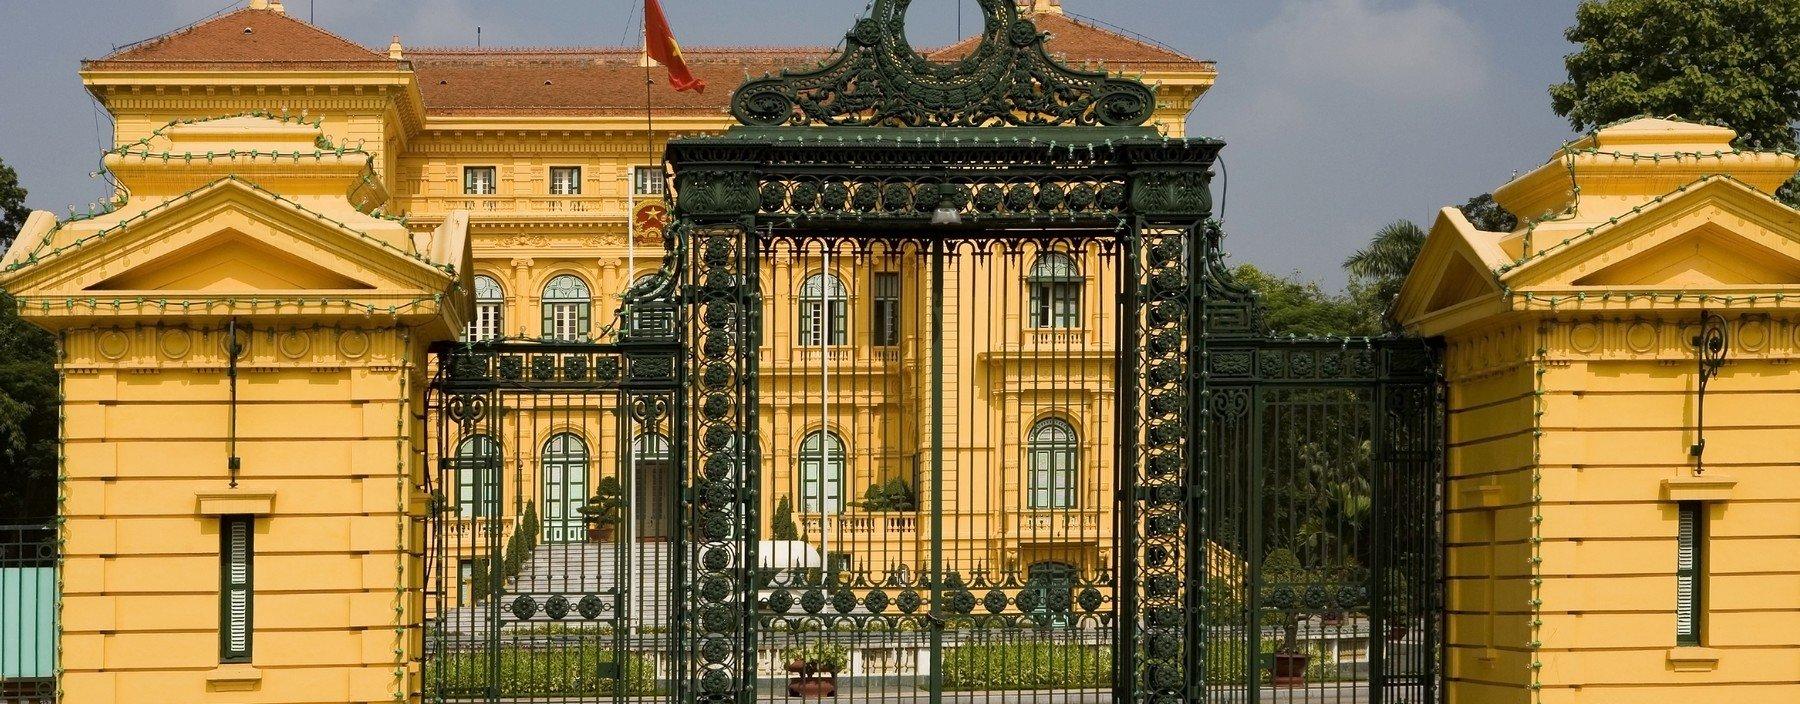 vn, hanoi, presidentieel paleis (2).jpg